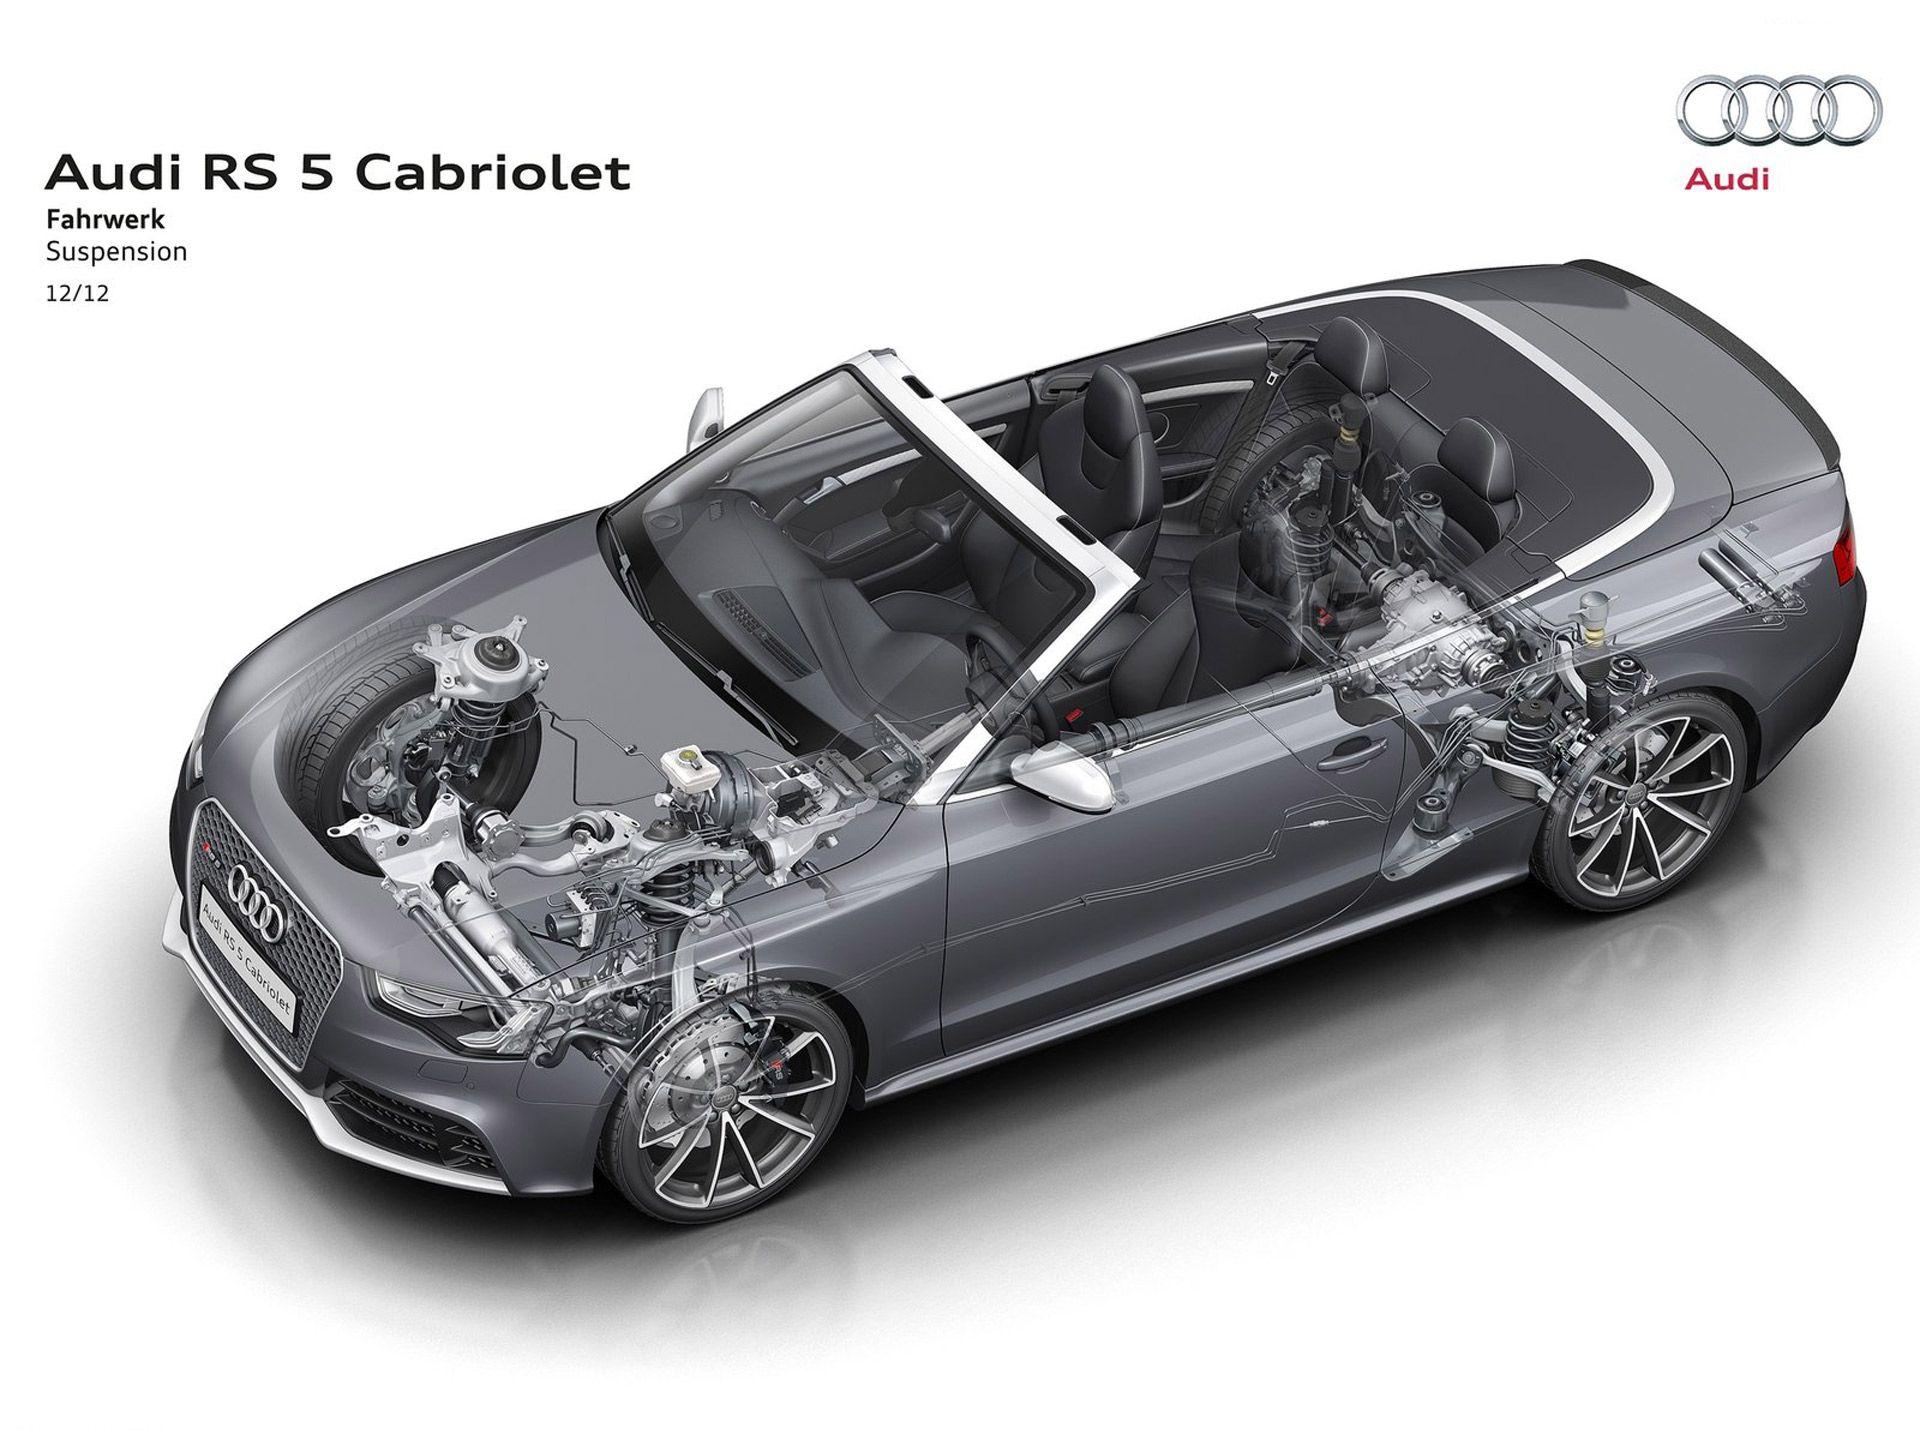 2014 Audi RS5 Cabriolet Suspension 2014 Audi RS5 Cabriolet Specs and ...